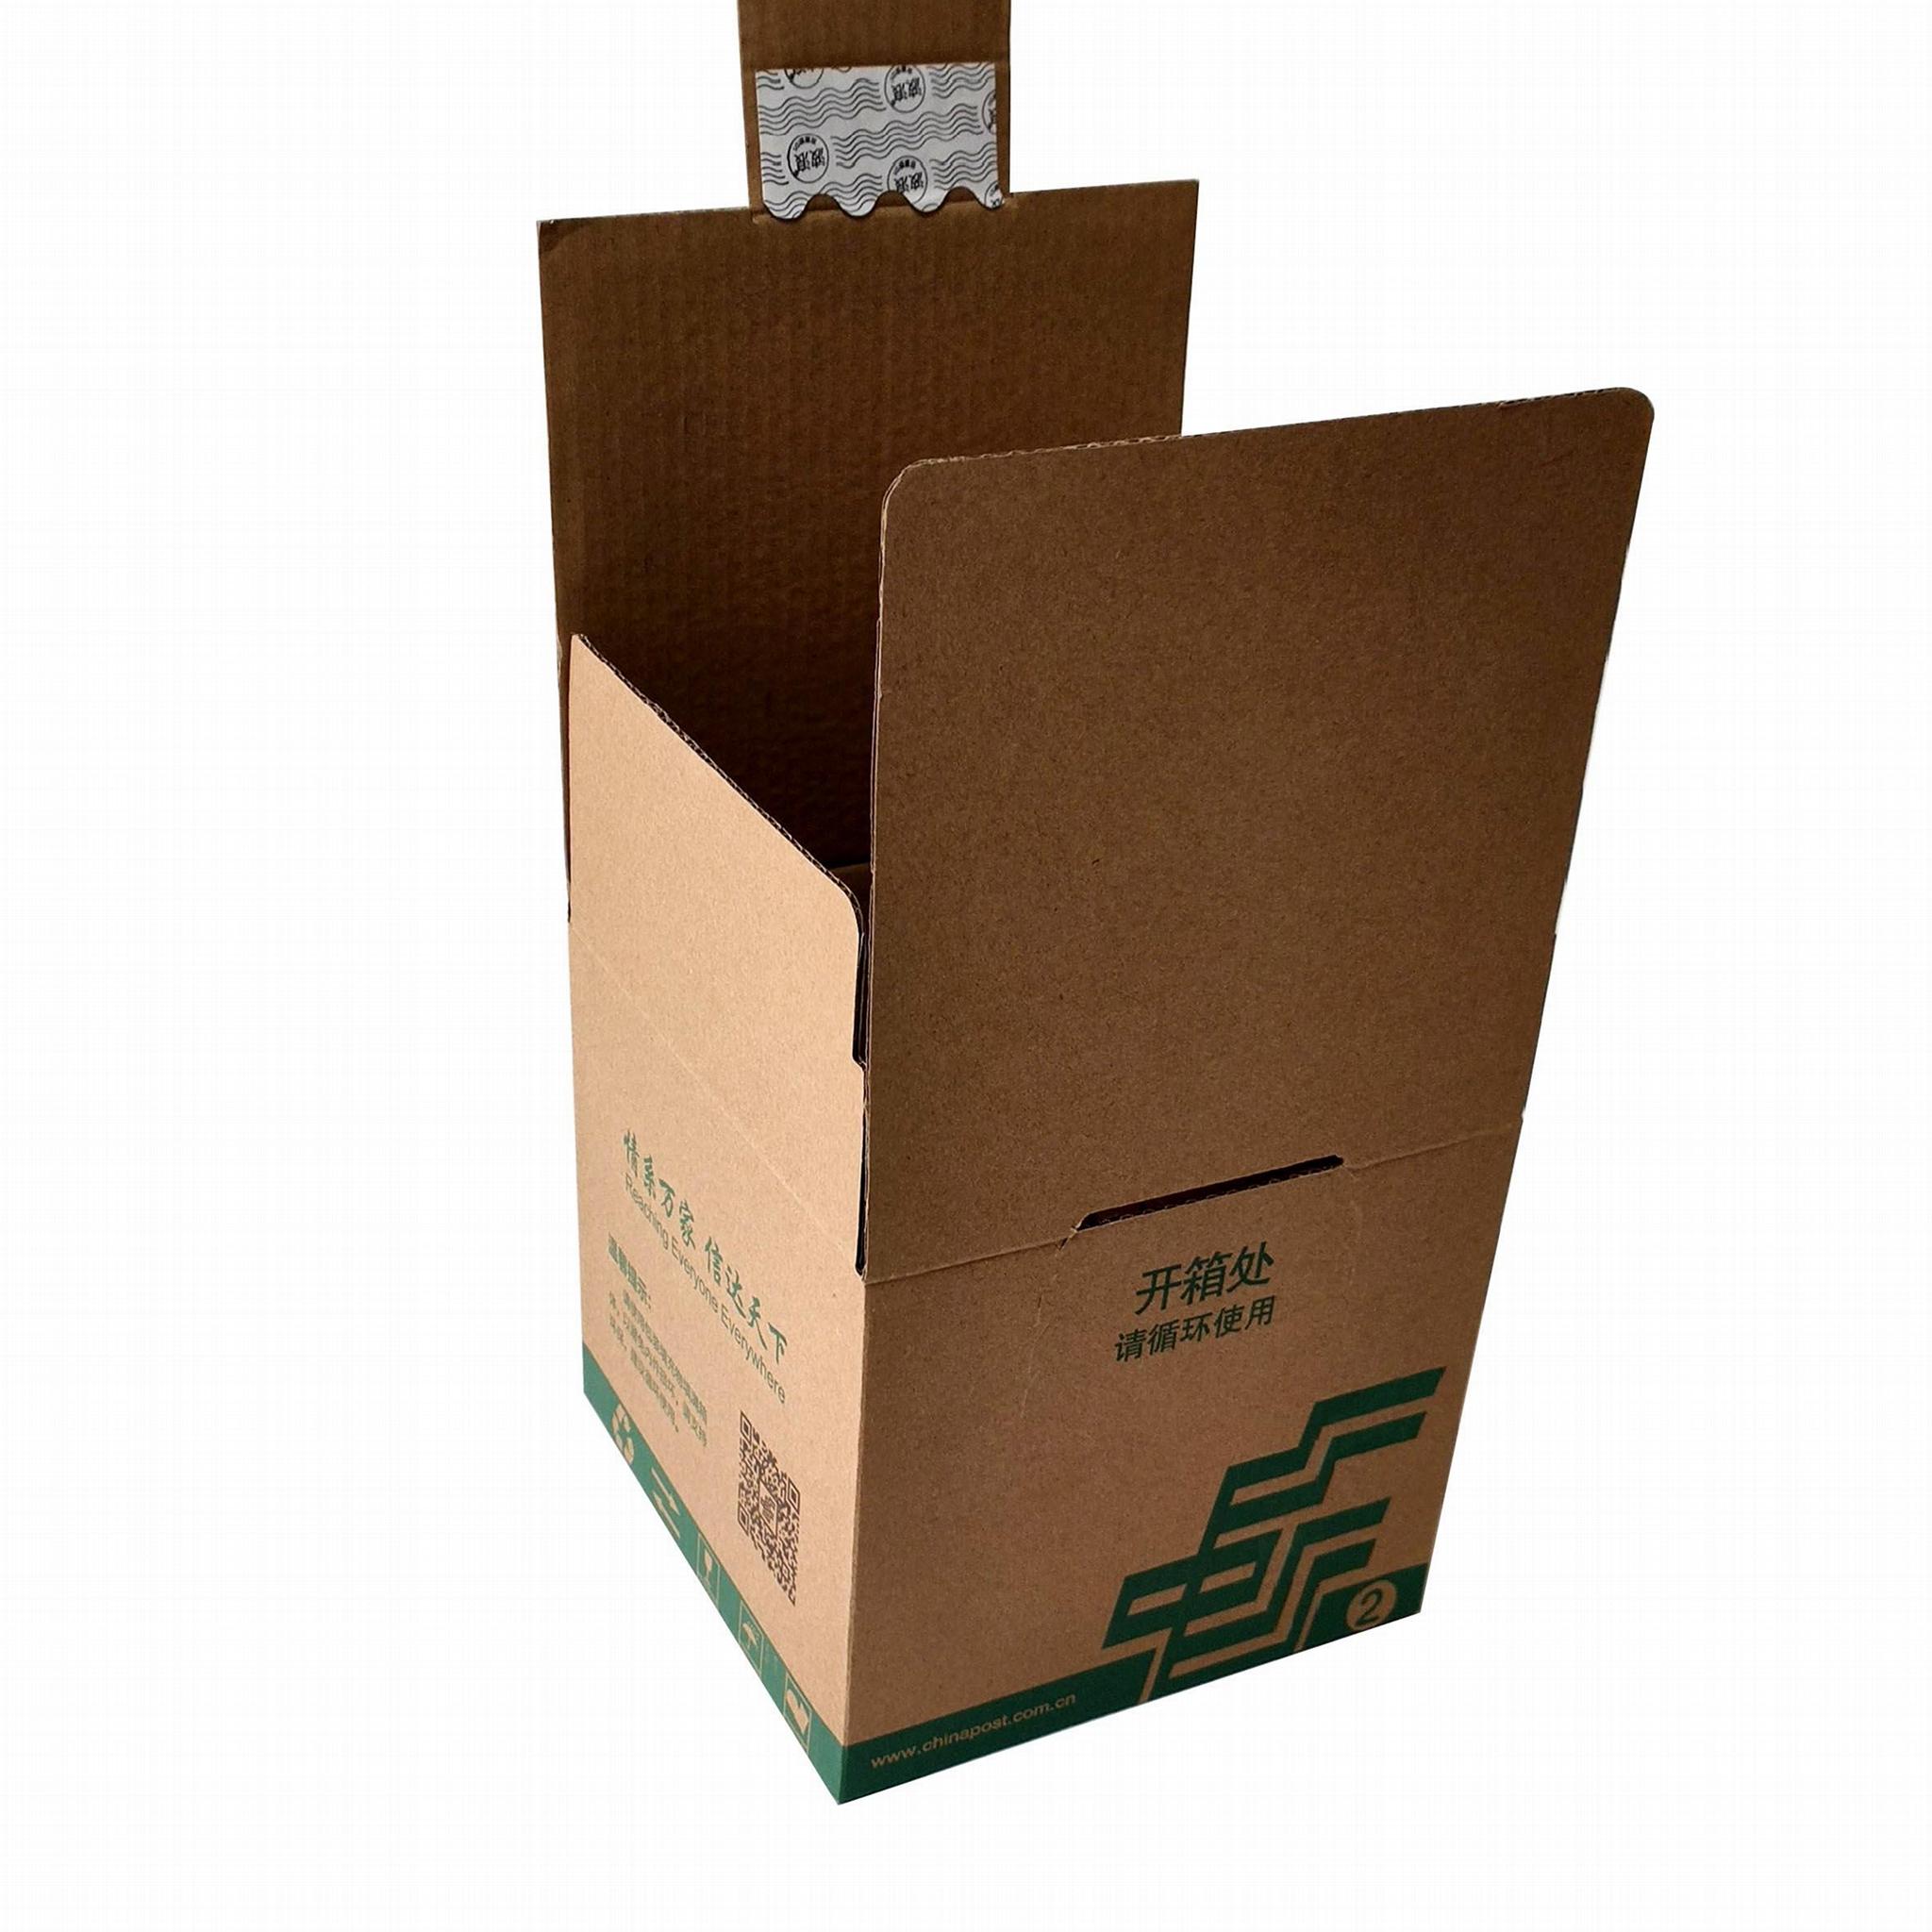 Mailbox with adhesive